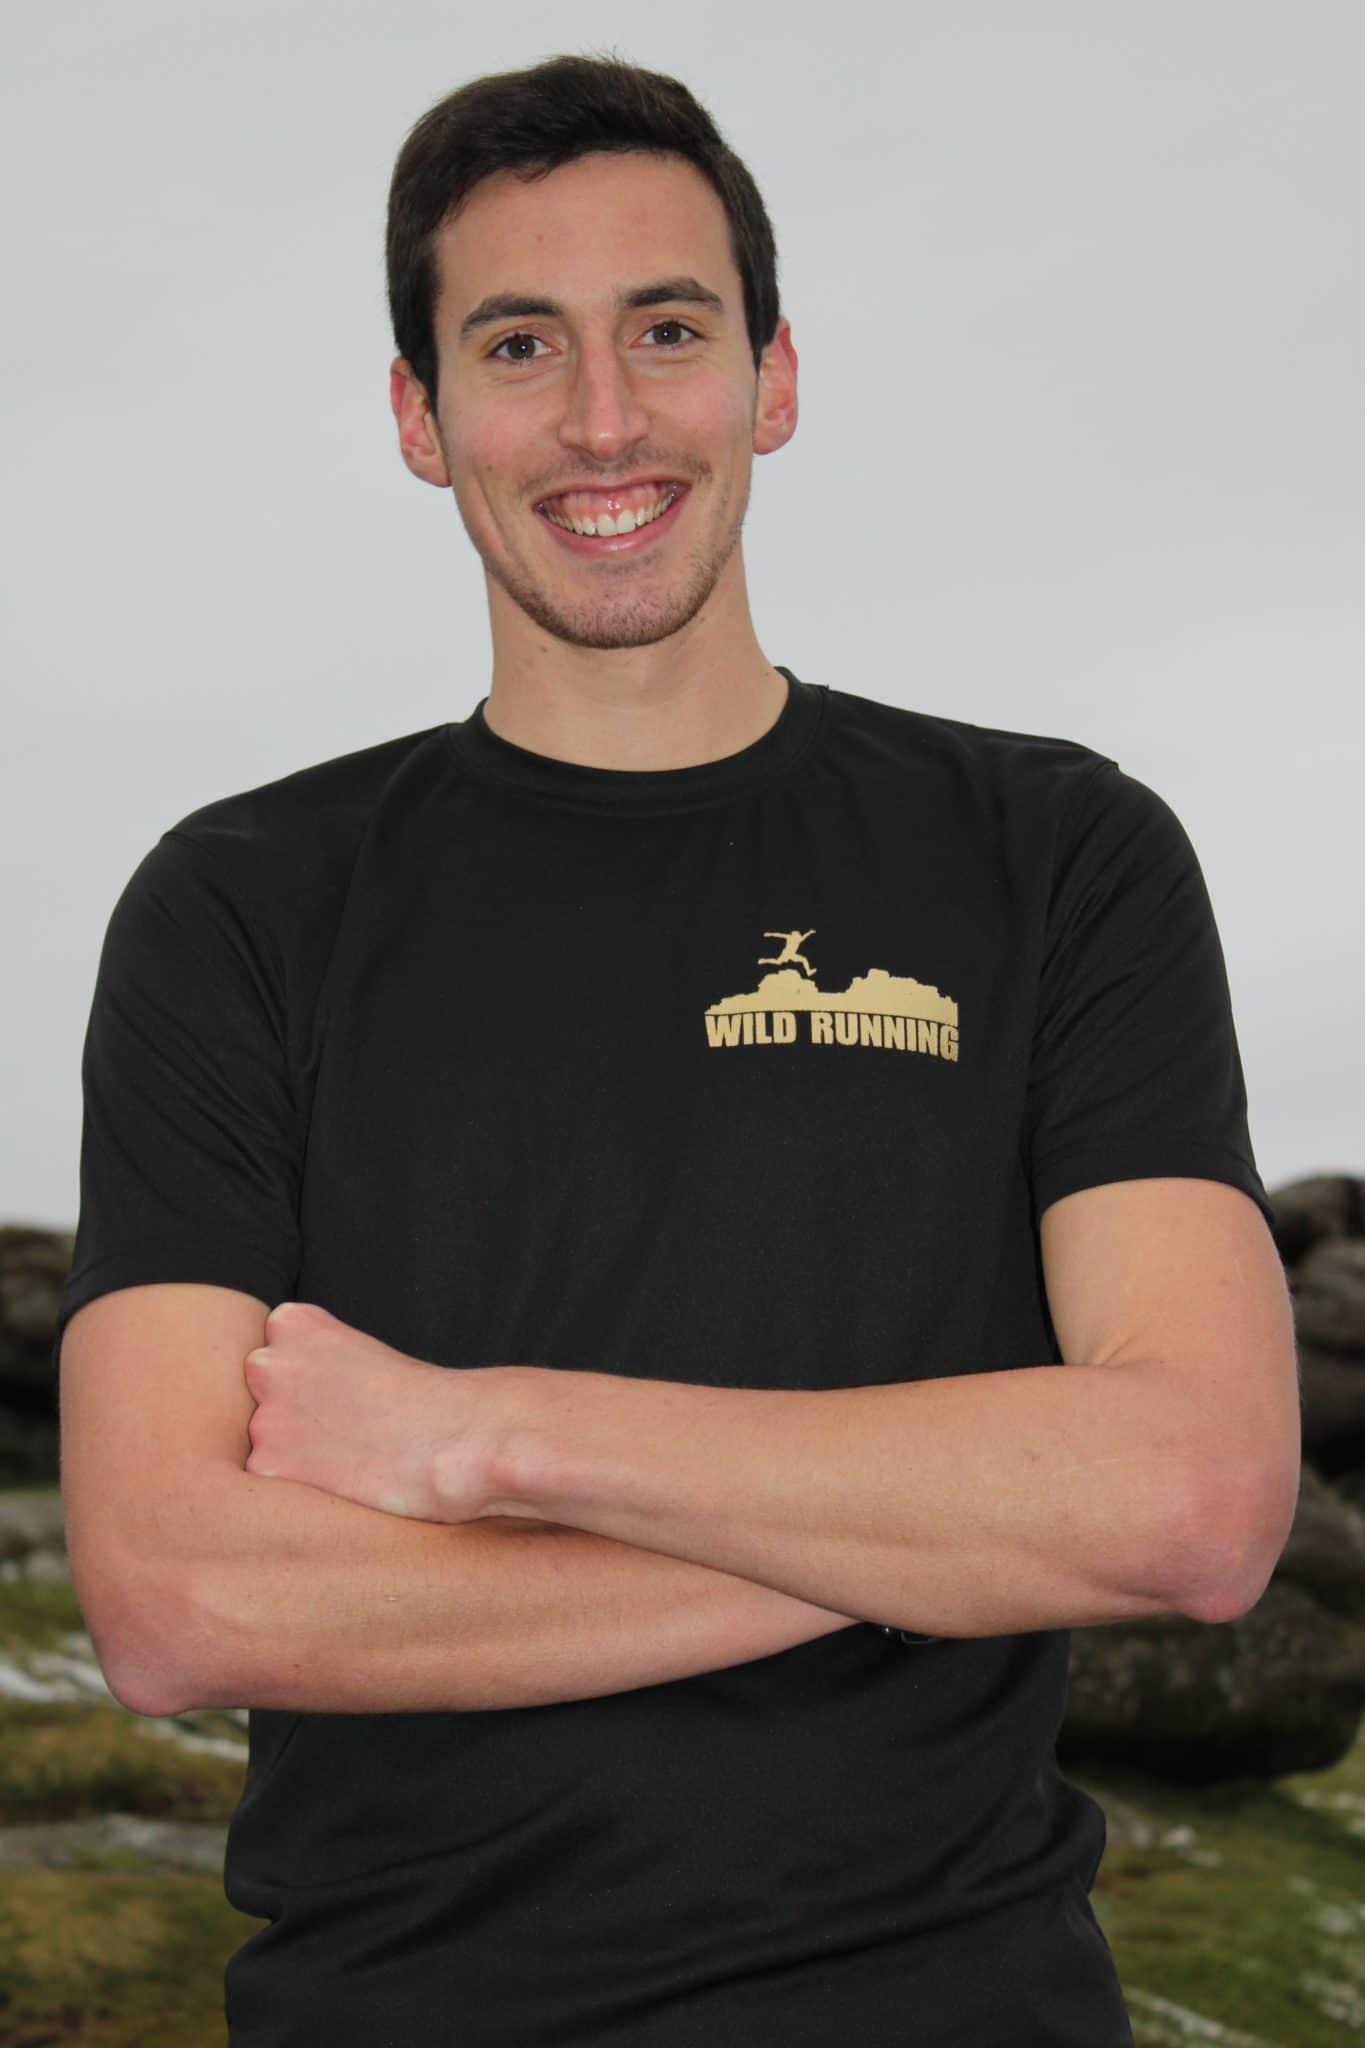 Wild Running technical tshirts Jack